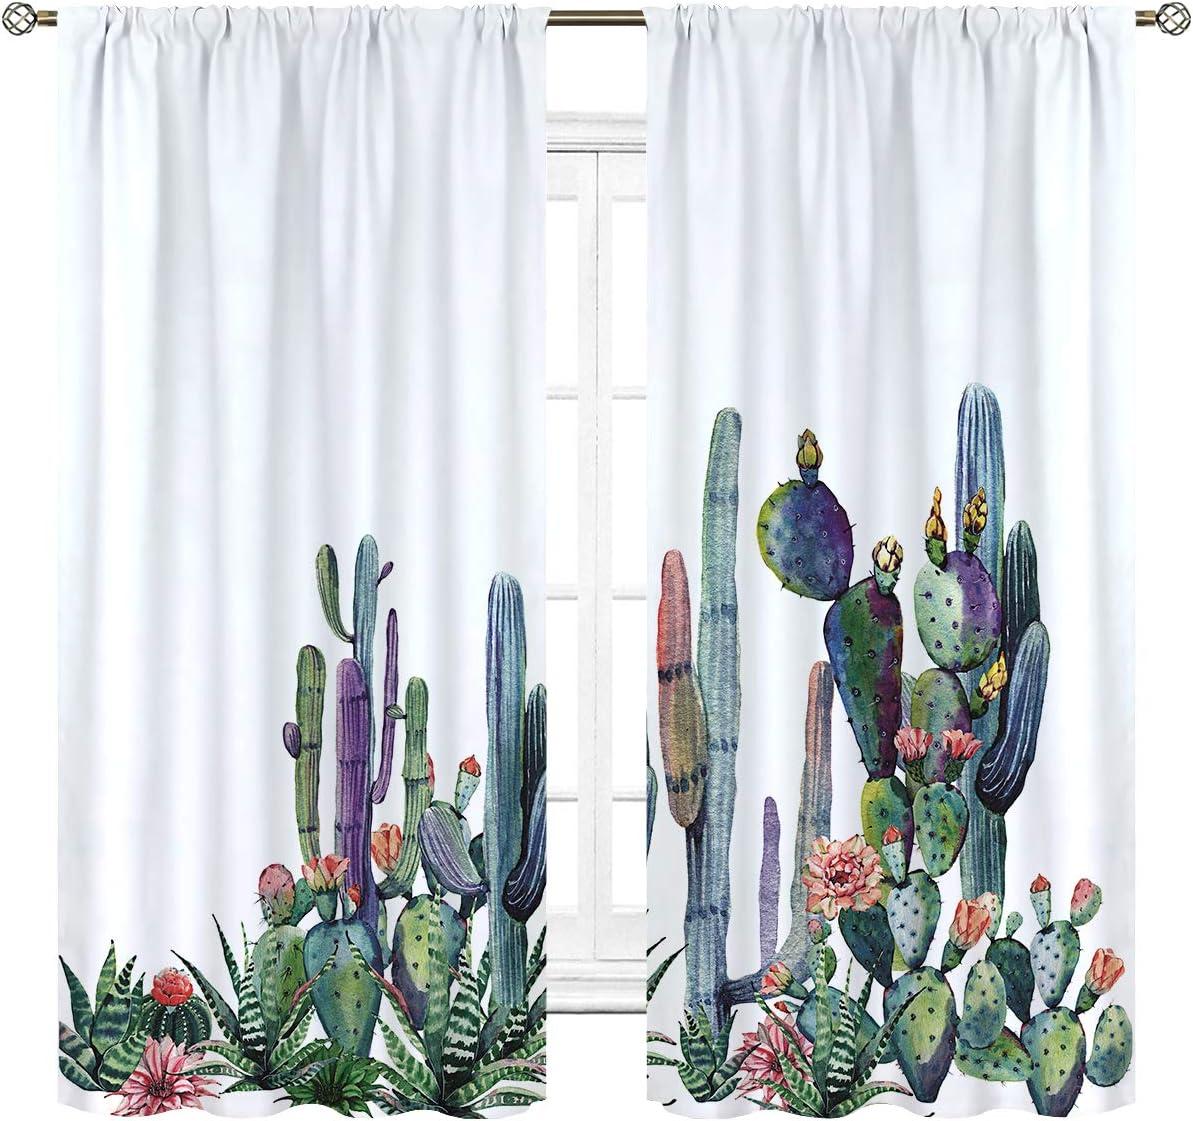 Cinblue Desert Cactus Curtains Rod Pocket Tropical Floral Succulent Saguaro Flower Cacti Nature Botanical Art Printed Living Room Bedroom Window Drapes Treatment Fabric 2 Panels 42 W x 63 L Inch